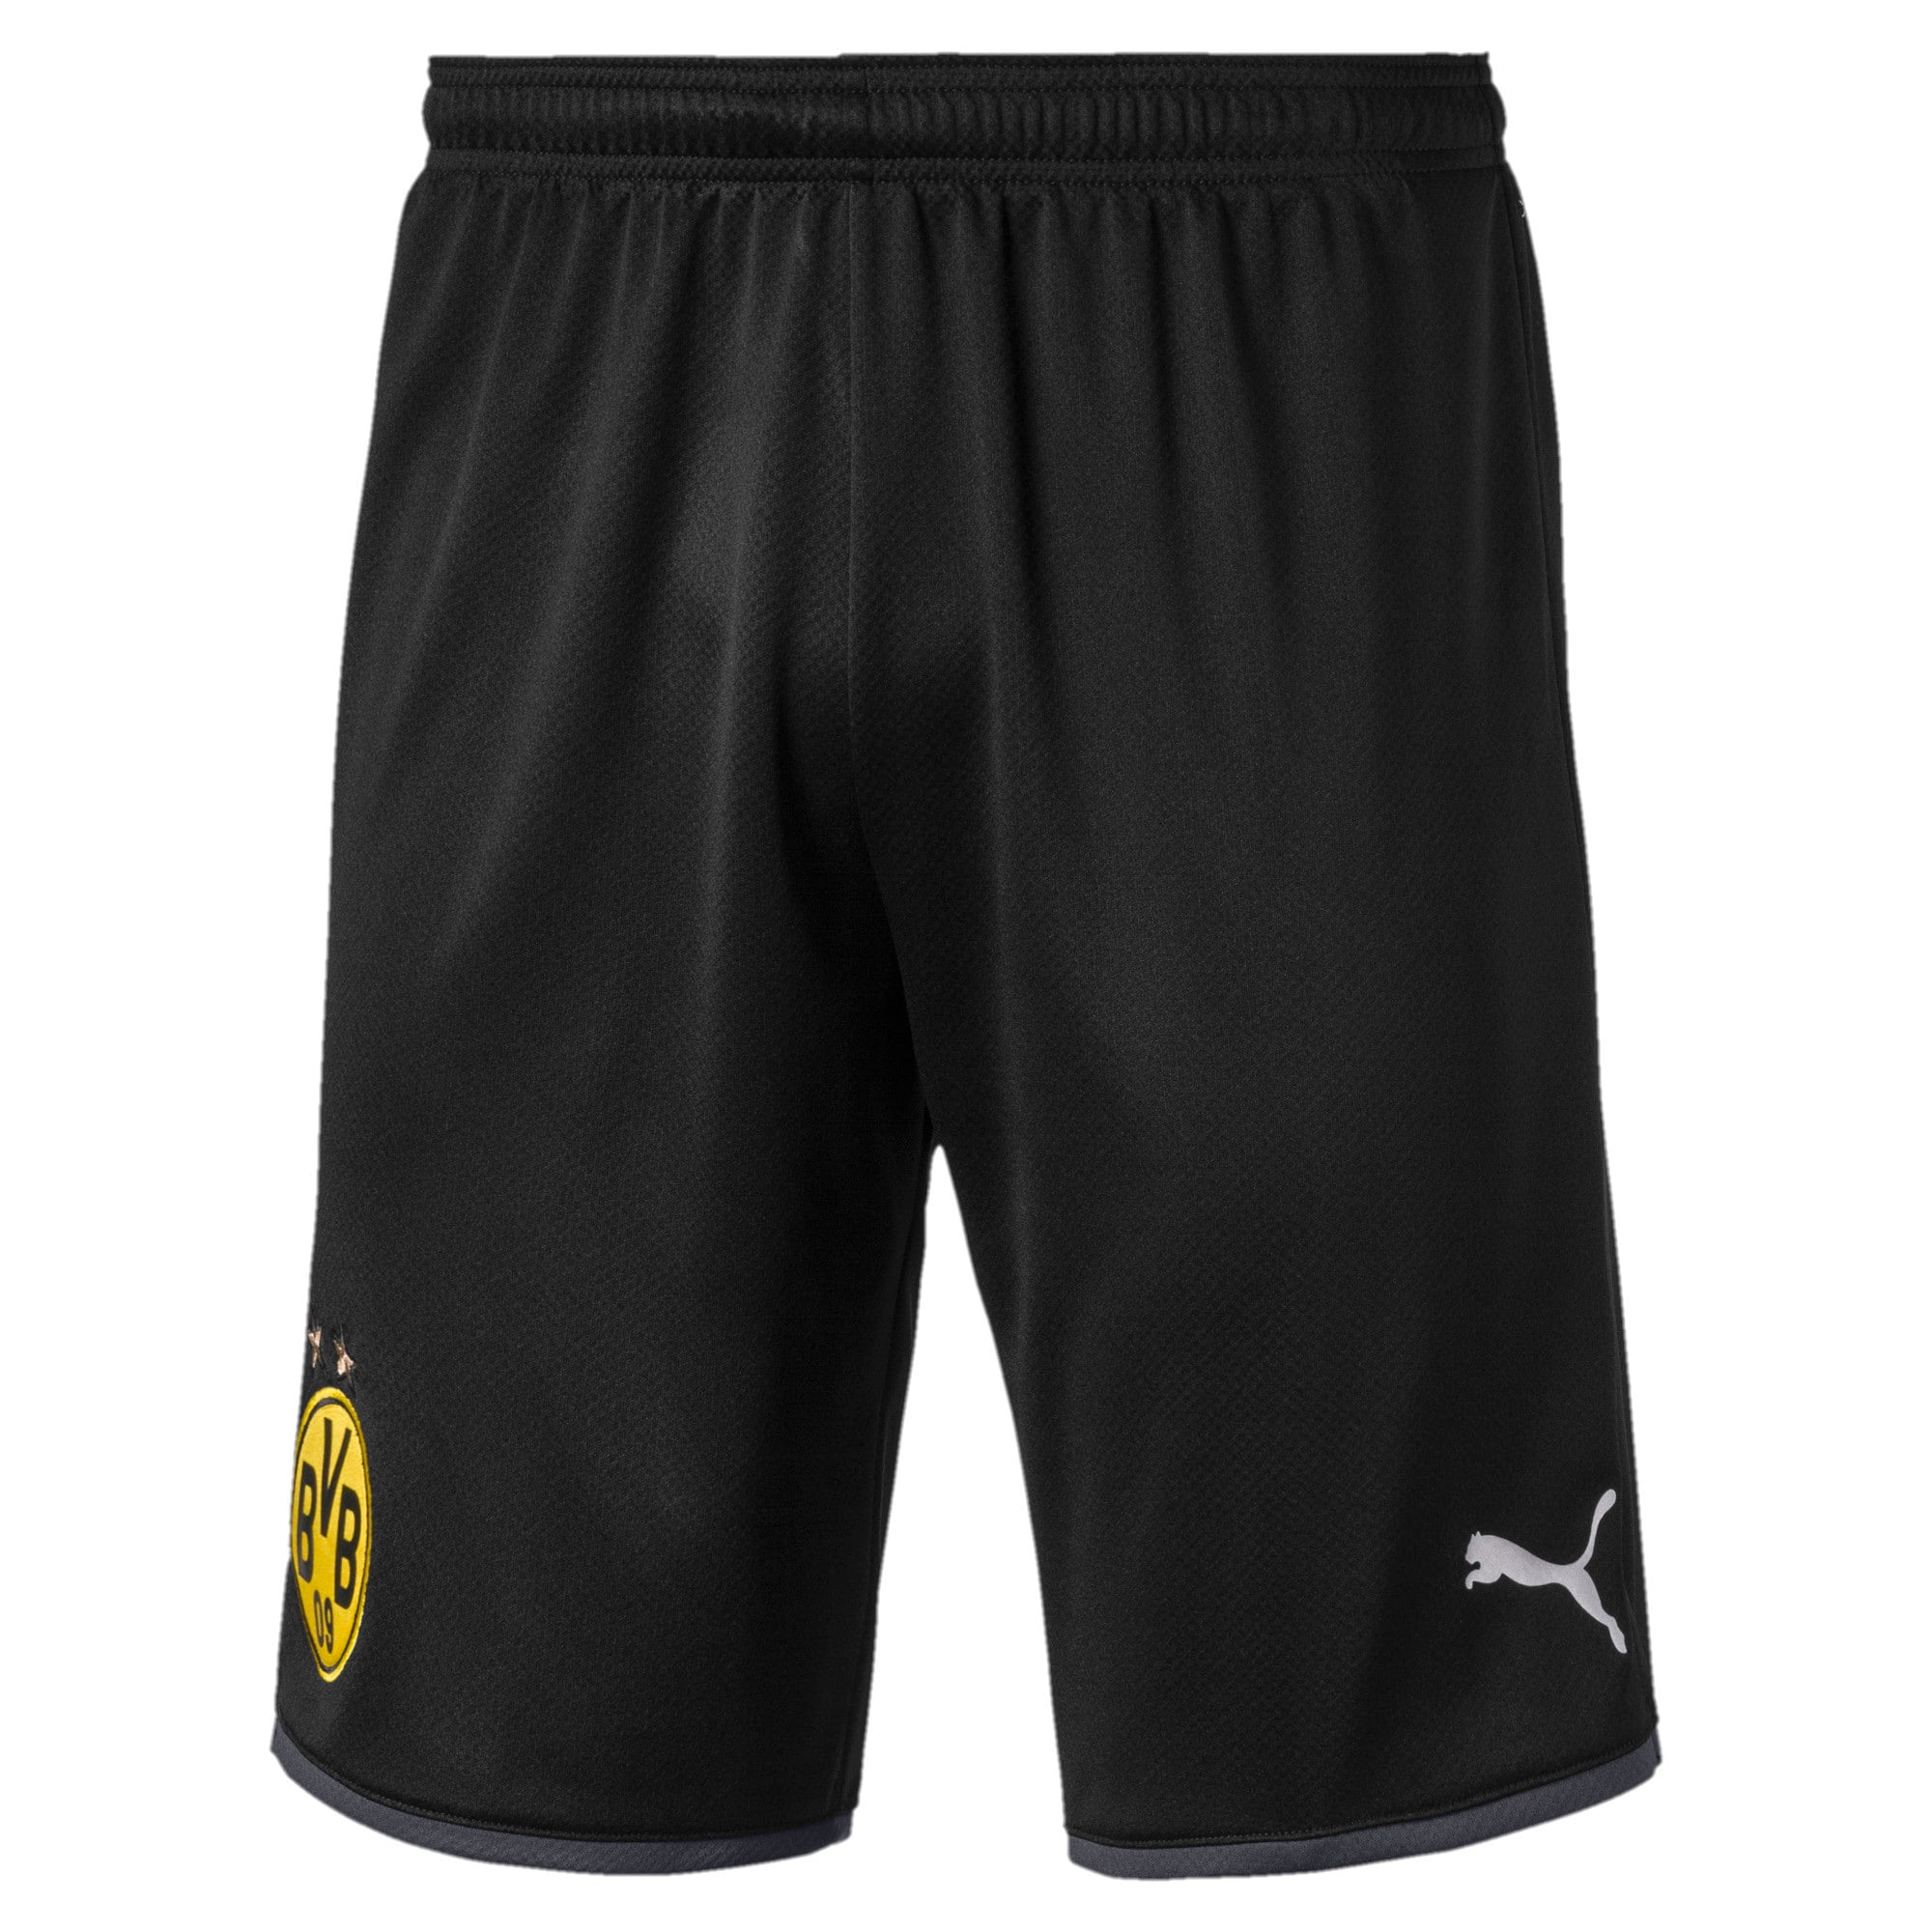 Thumbnail 1 of BVB Men's Away Replica Shorts, Puma Black-Ebony, medium